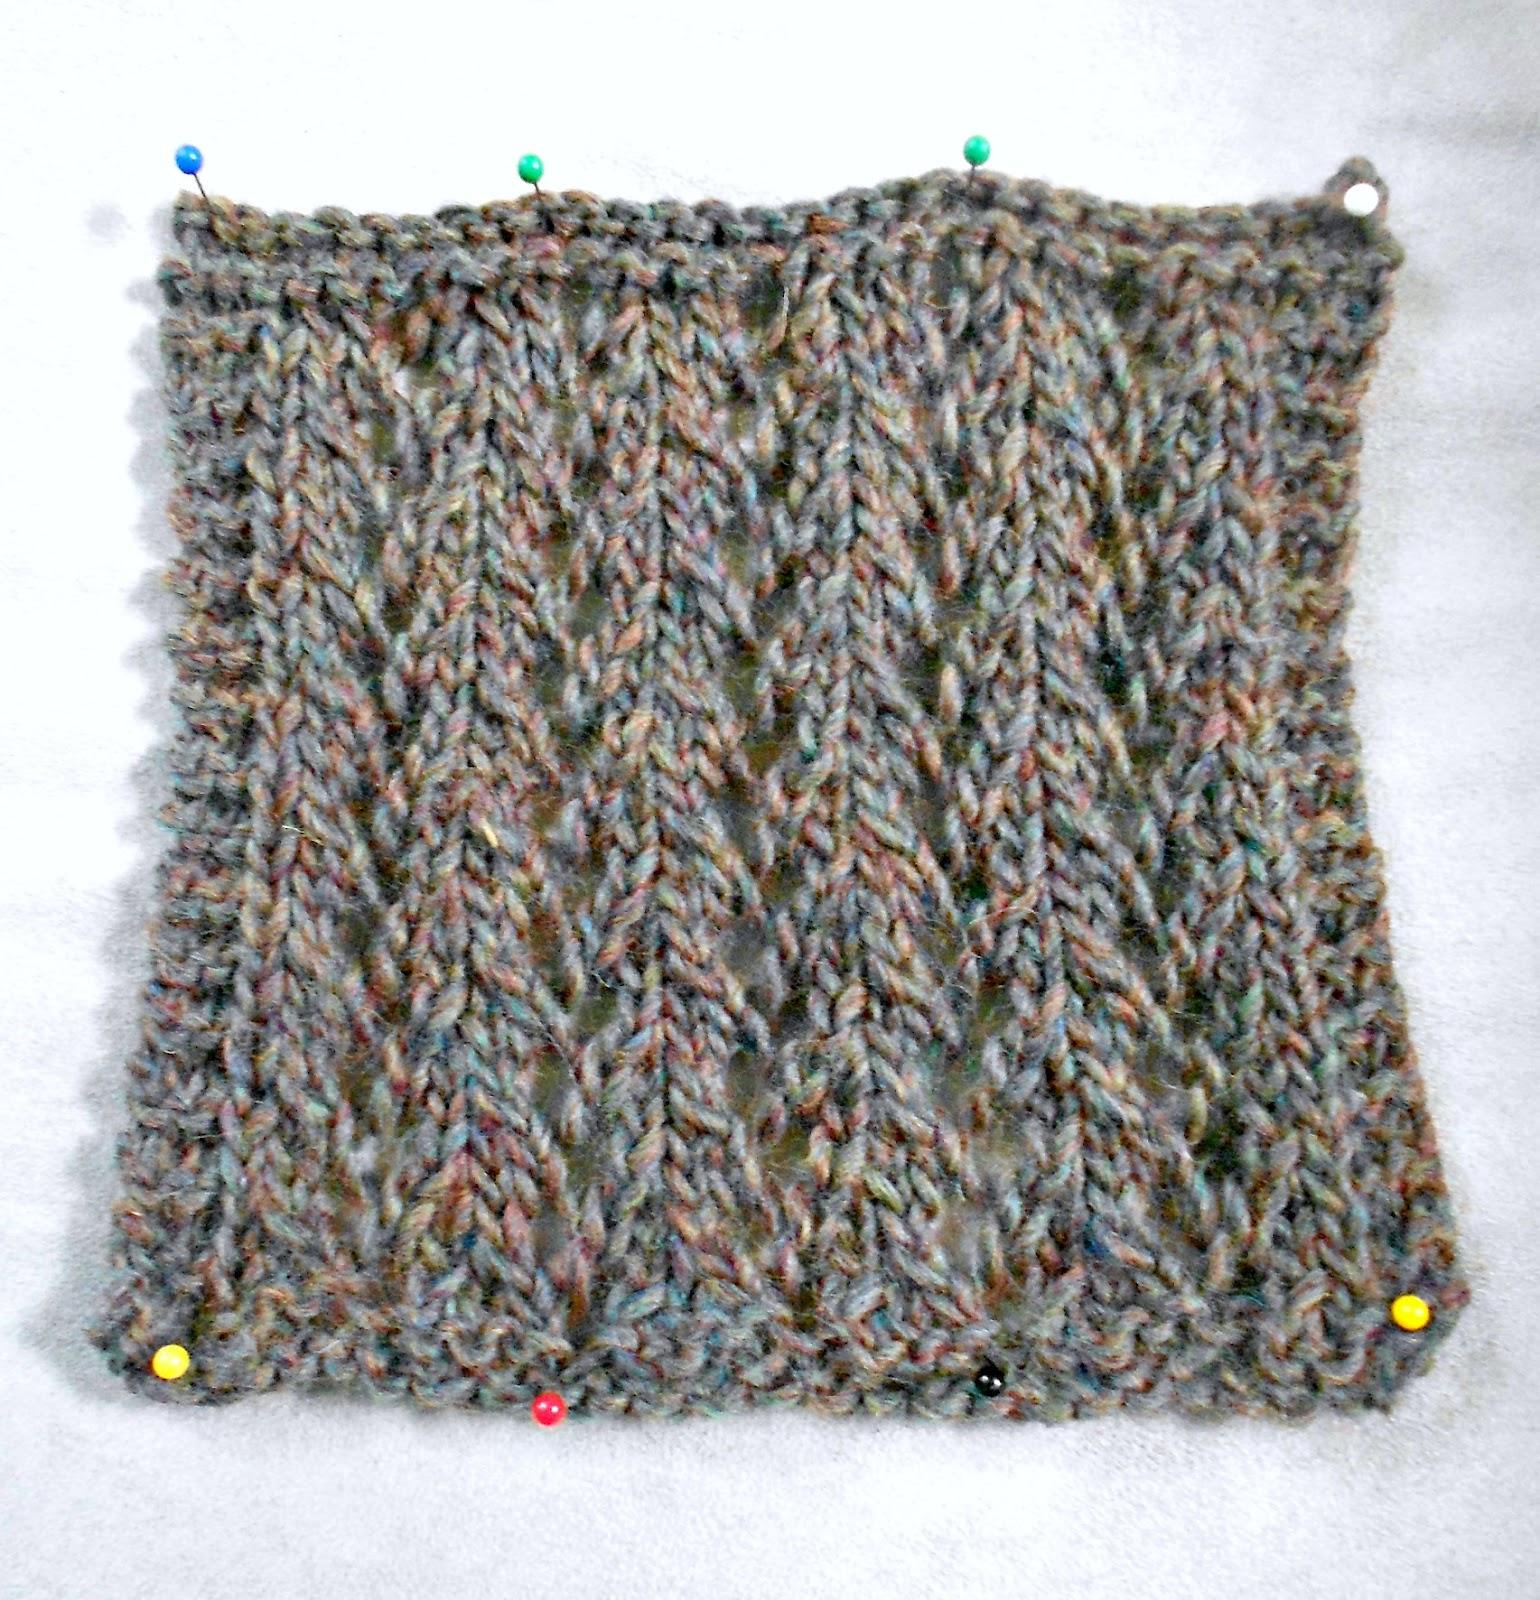 Ladder Lace Knitting Pattern : Blue Betty: Stitch Guide: Eyelet Ladder